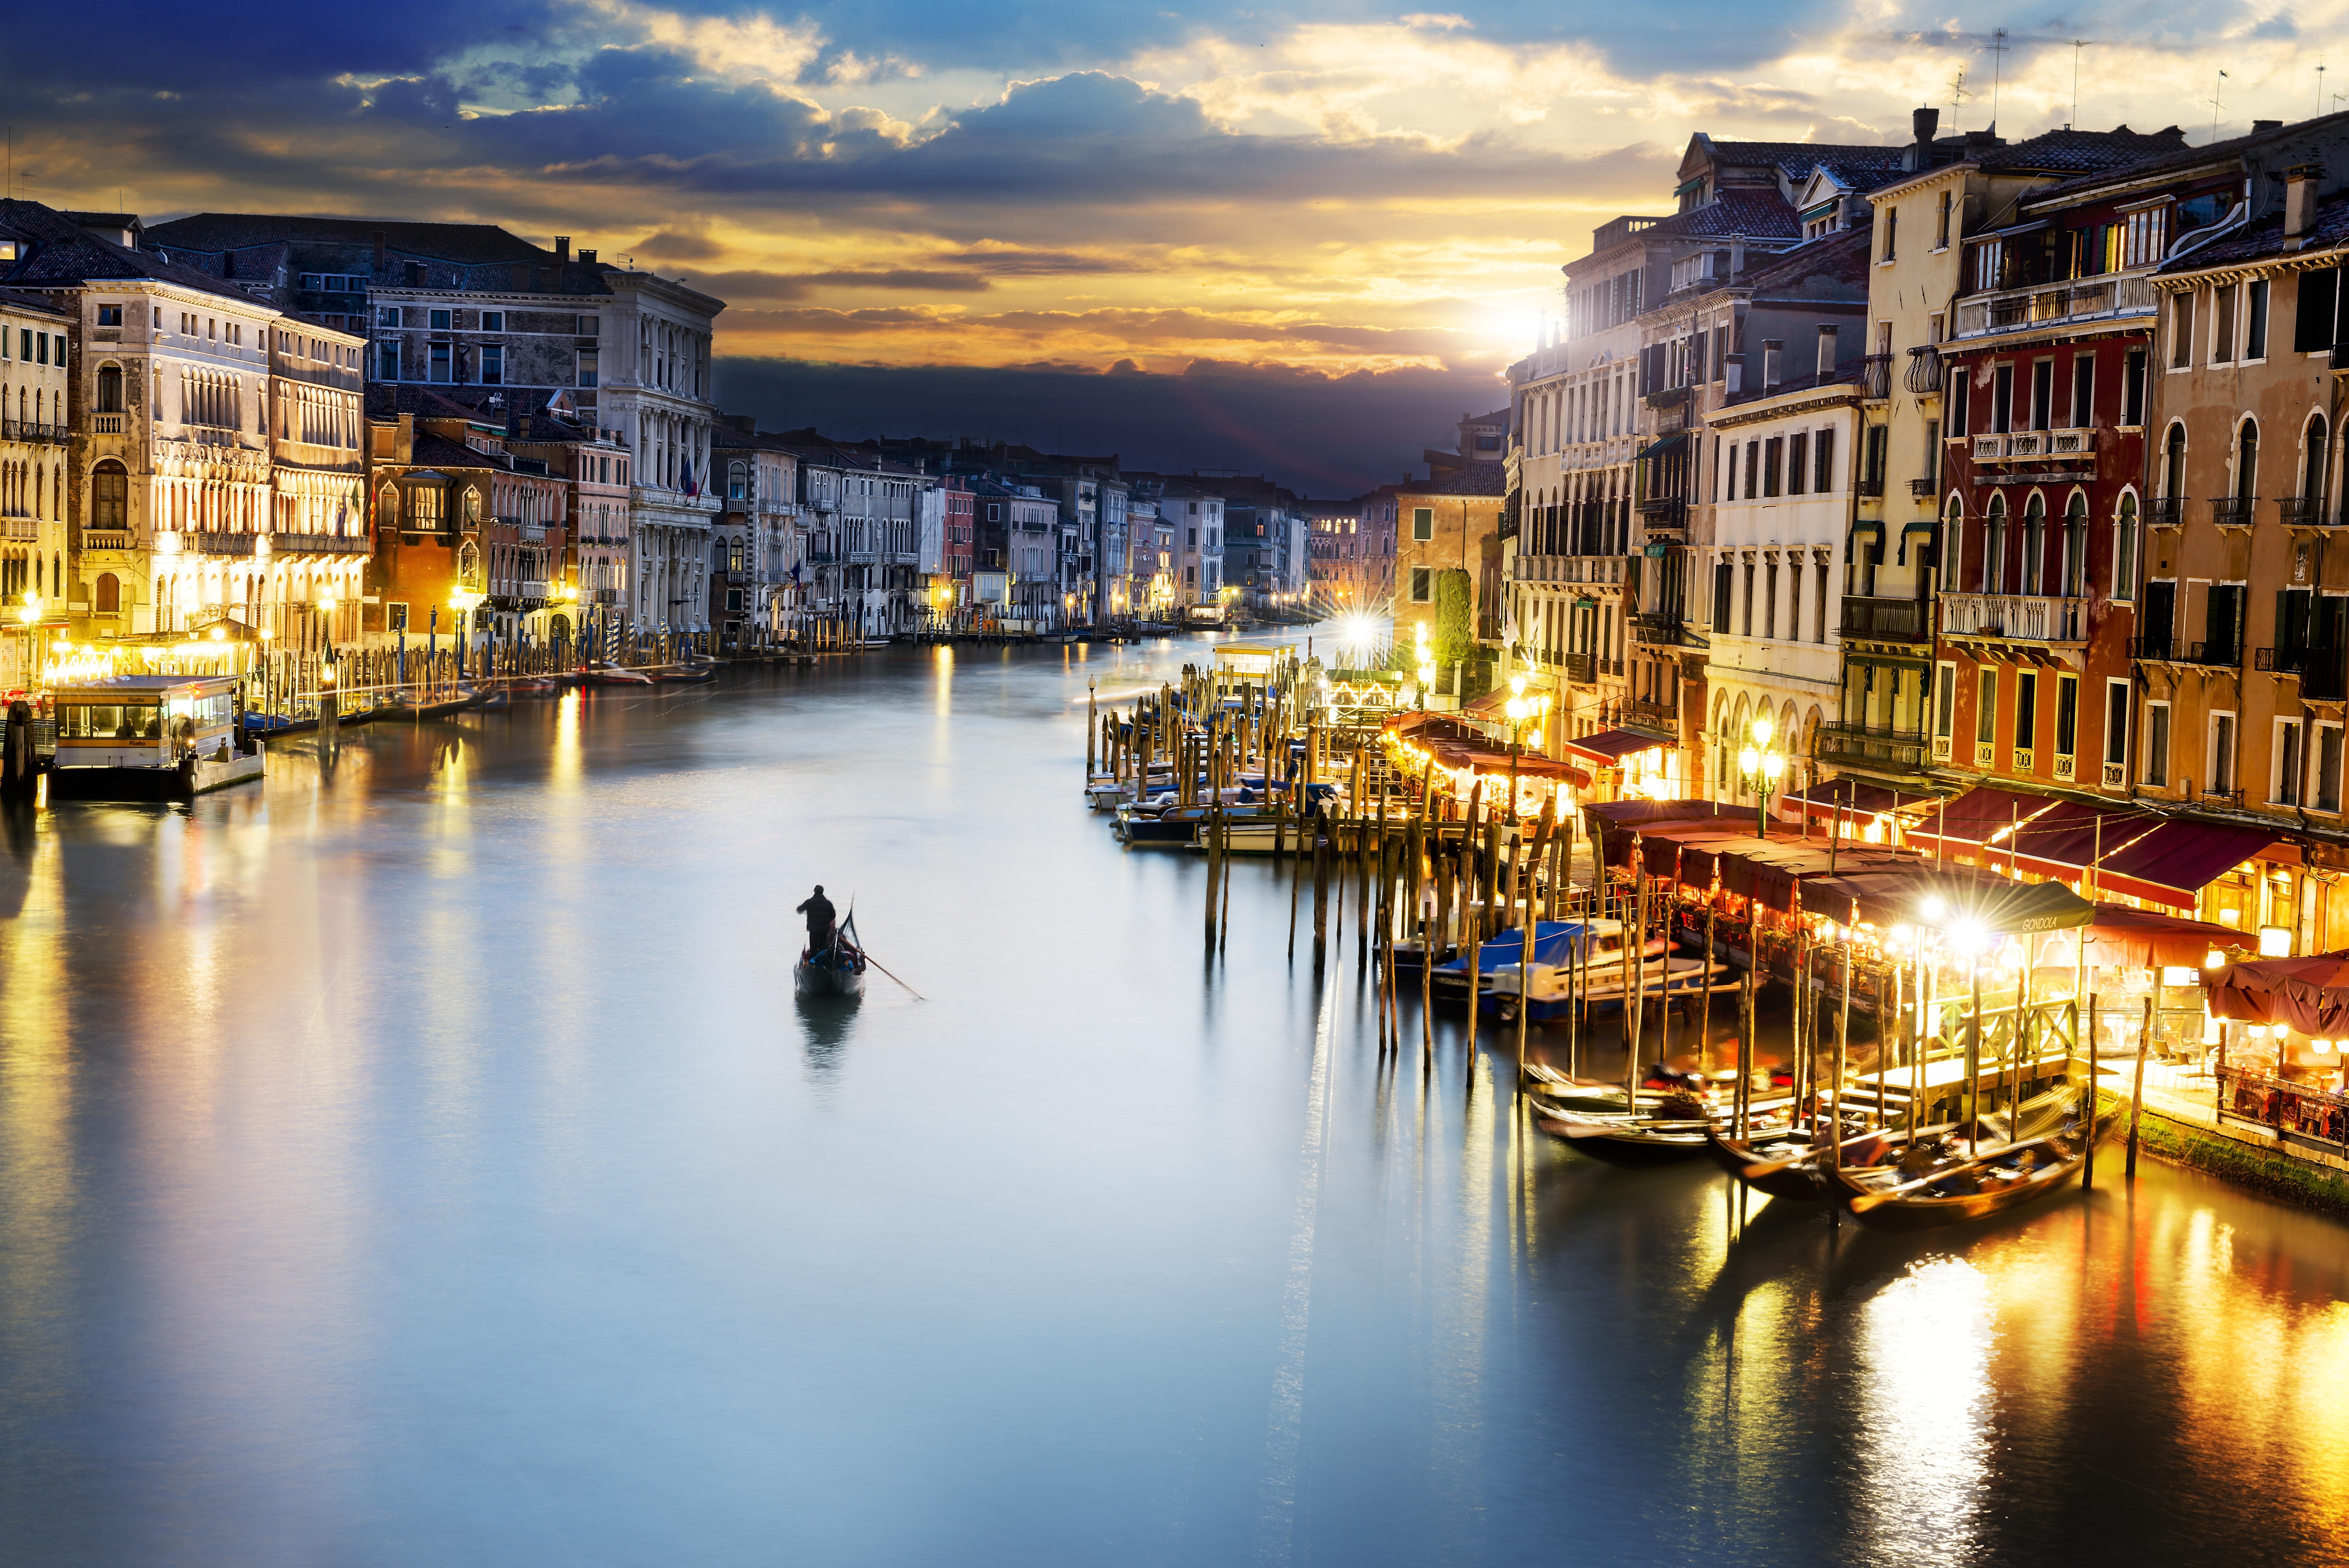 City Venice Italy Dreaming Beauti Hd City Night Wallpaper 7059x4712